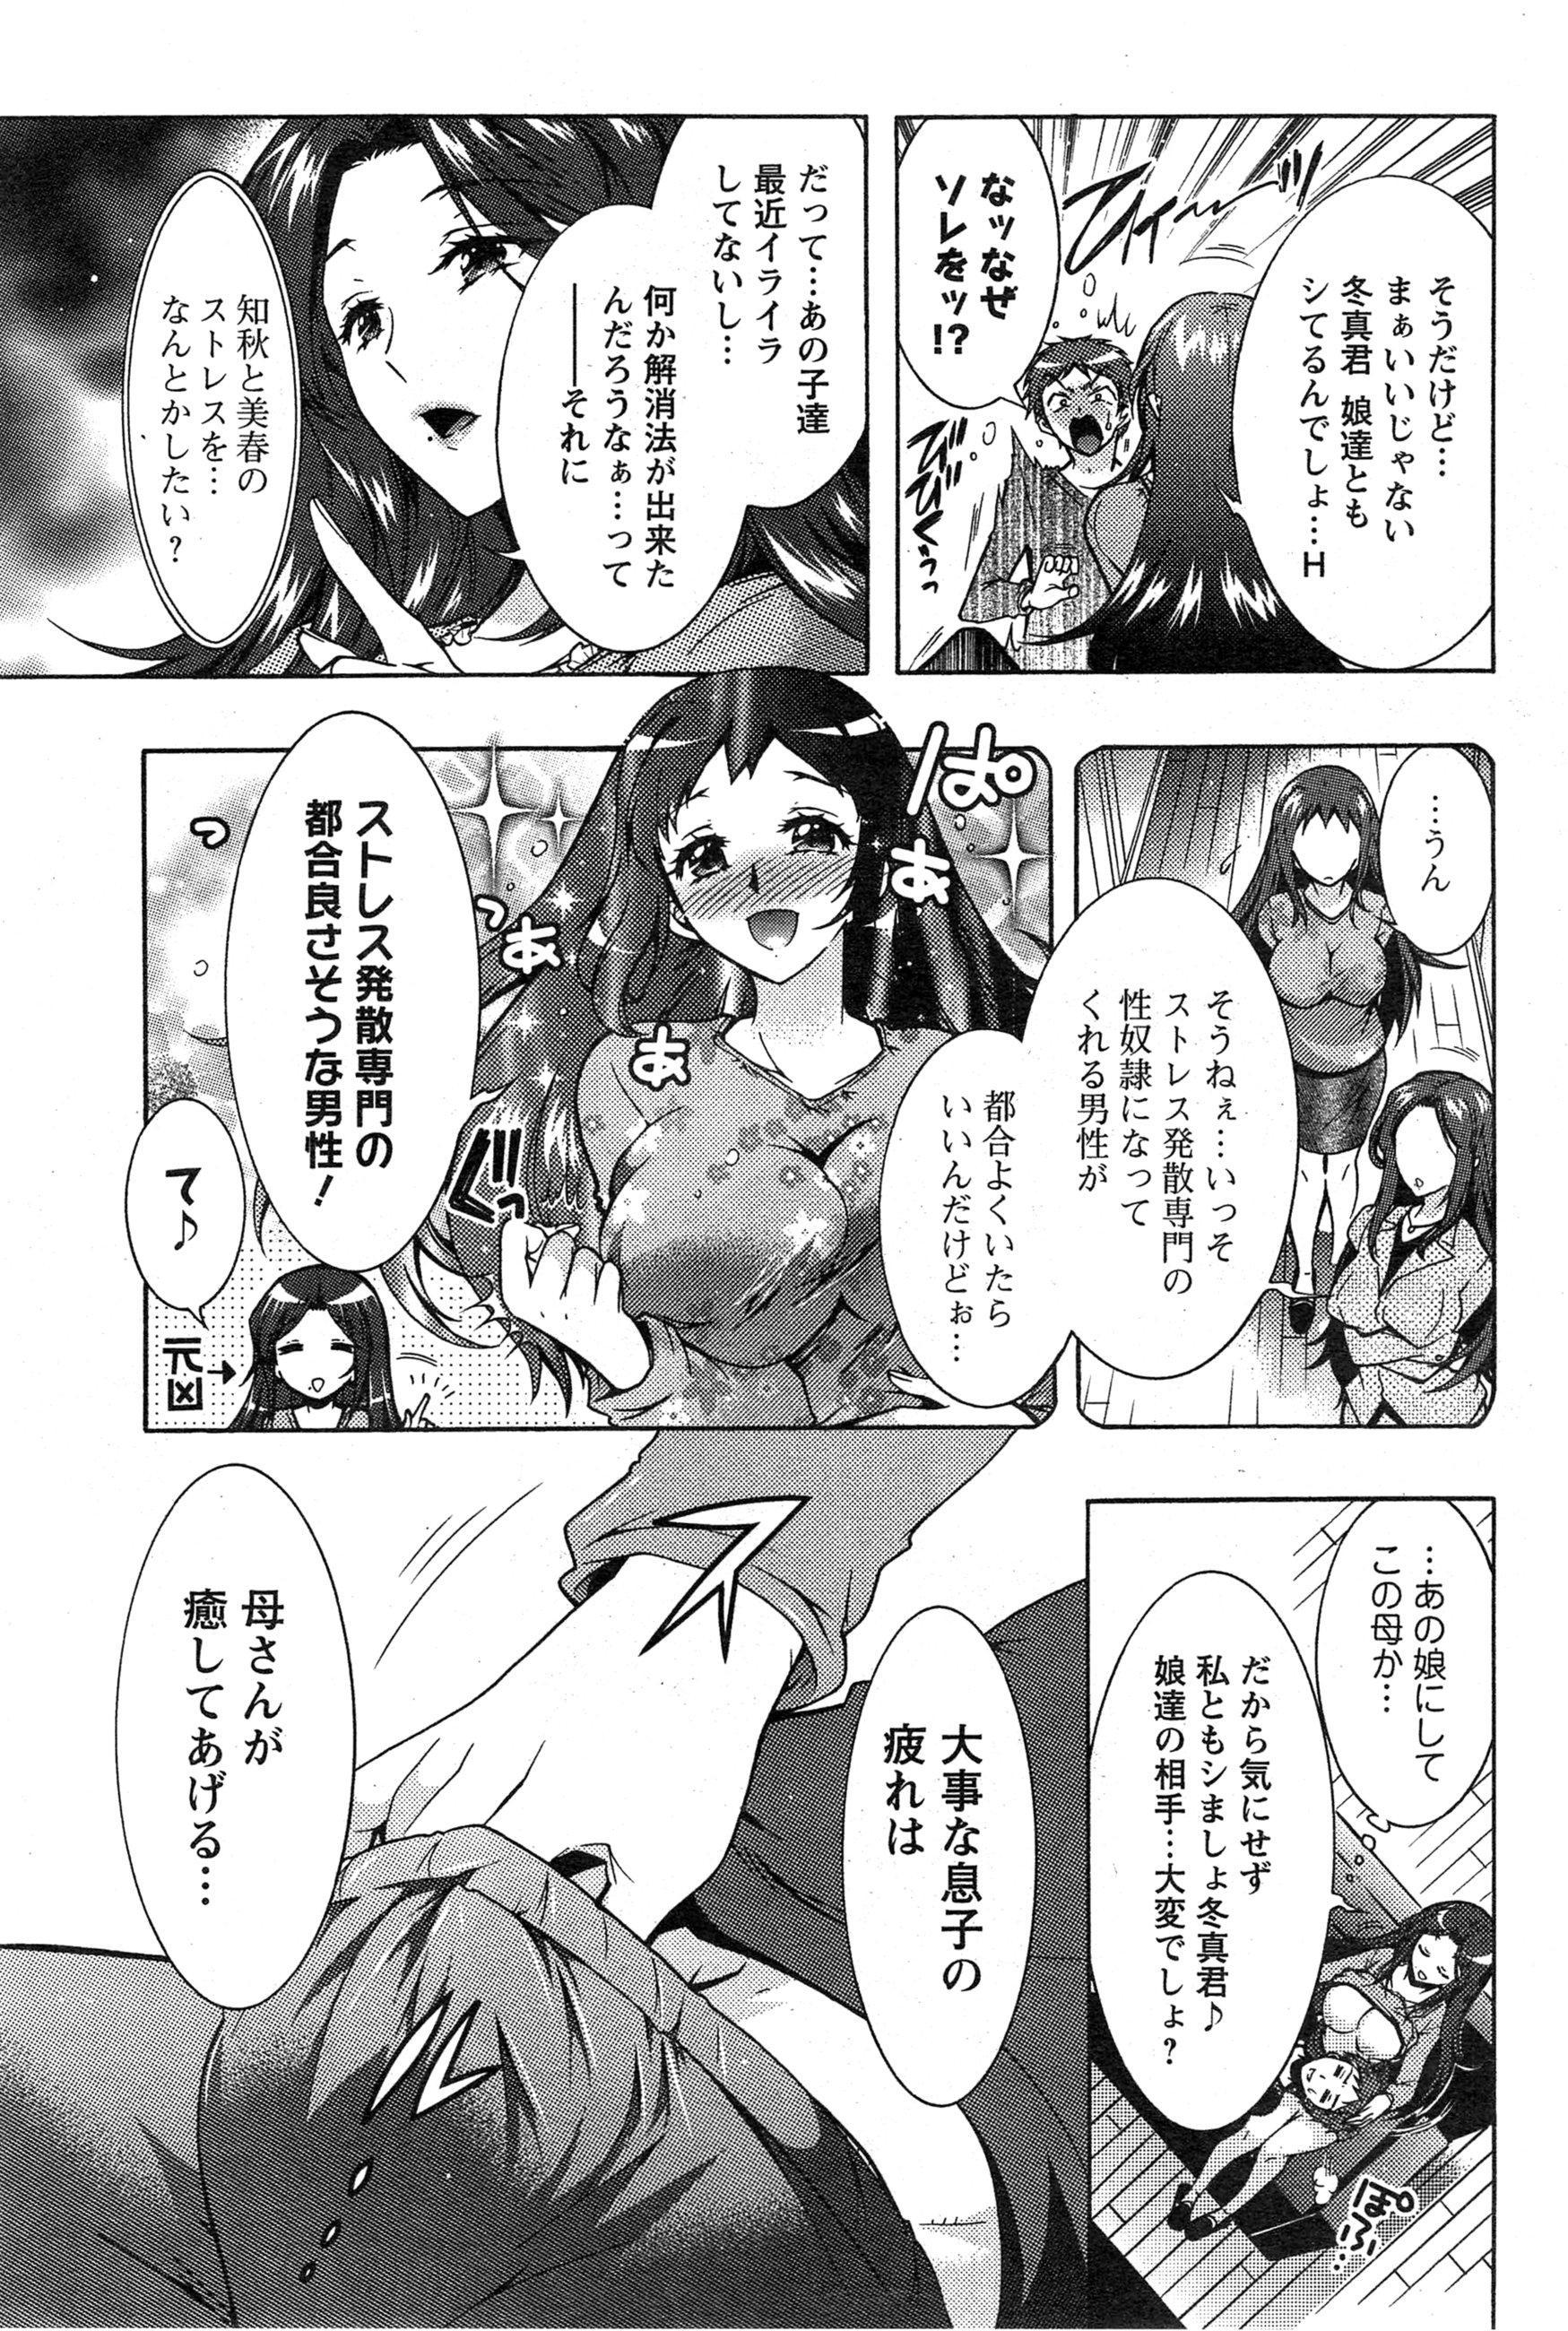 [Honda Arima] Sanshimai no Omocha - The Slave of Three Sisters Ch. 1-6 49